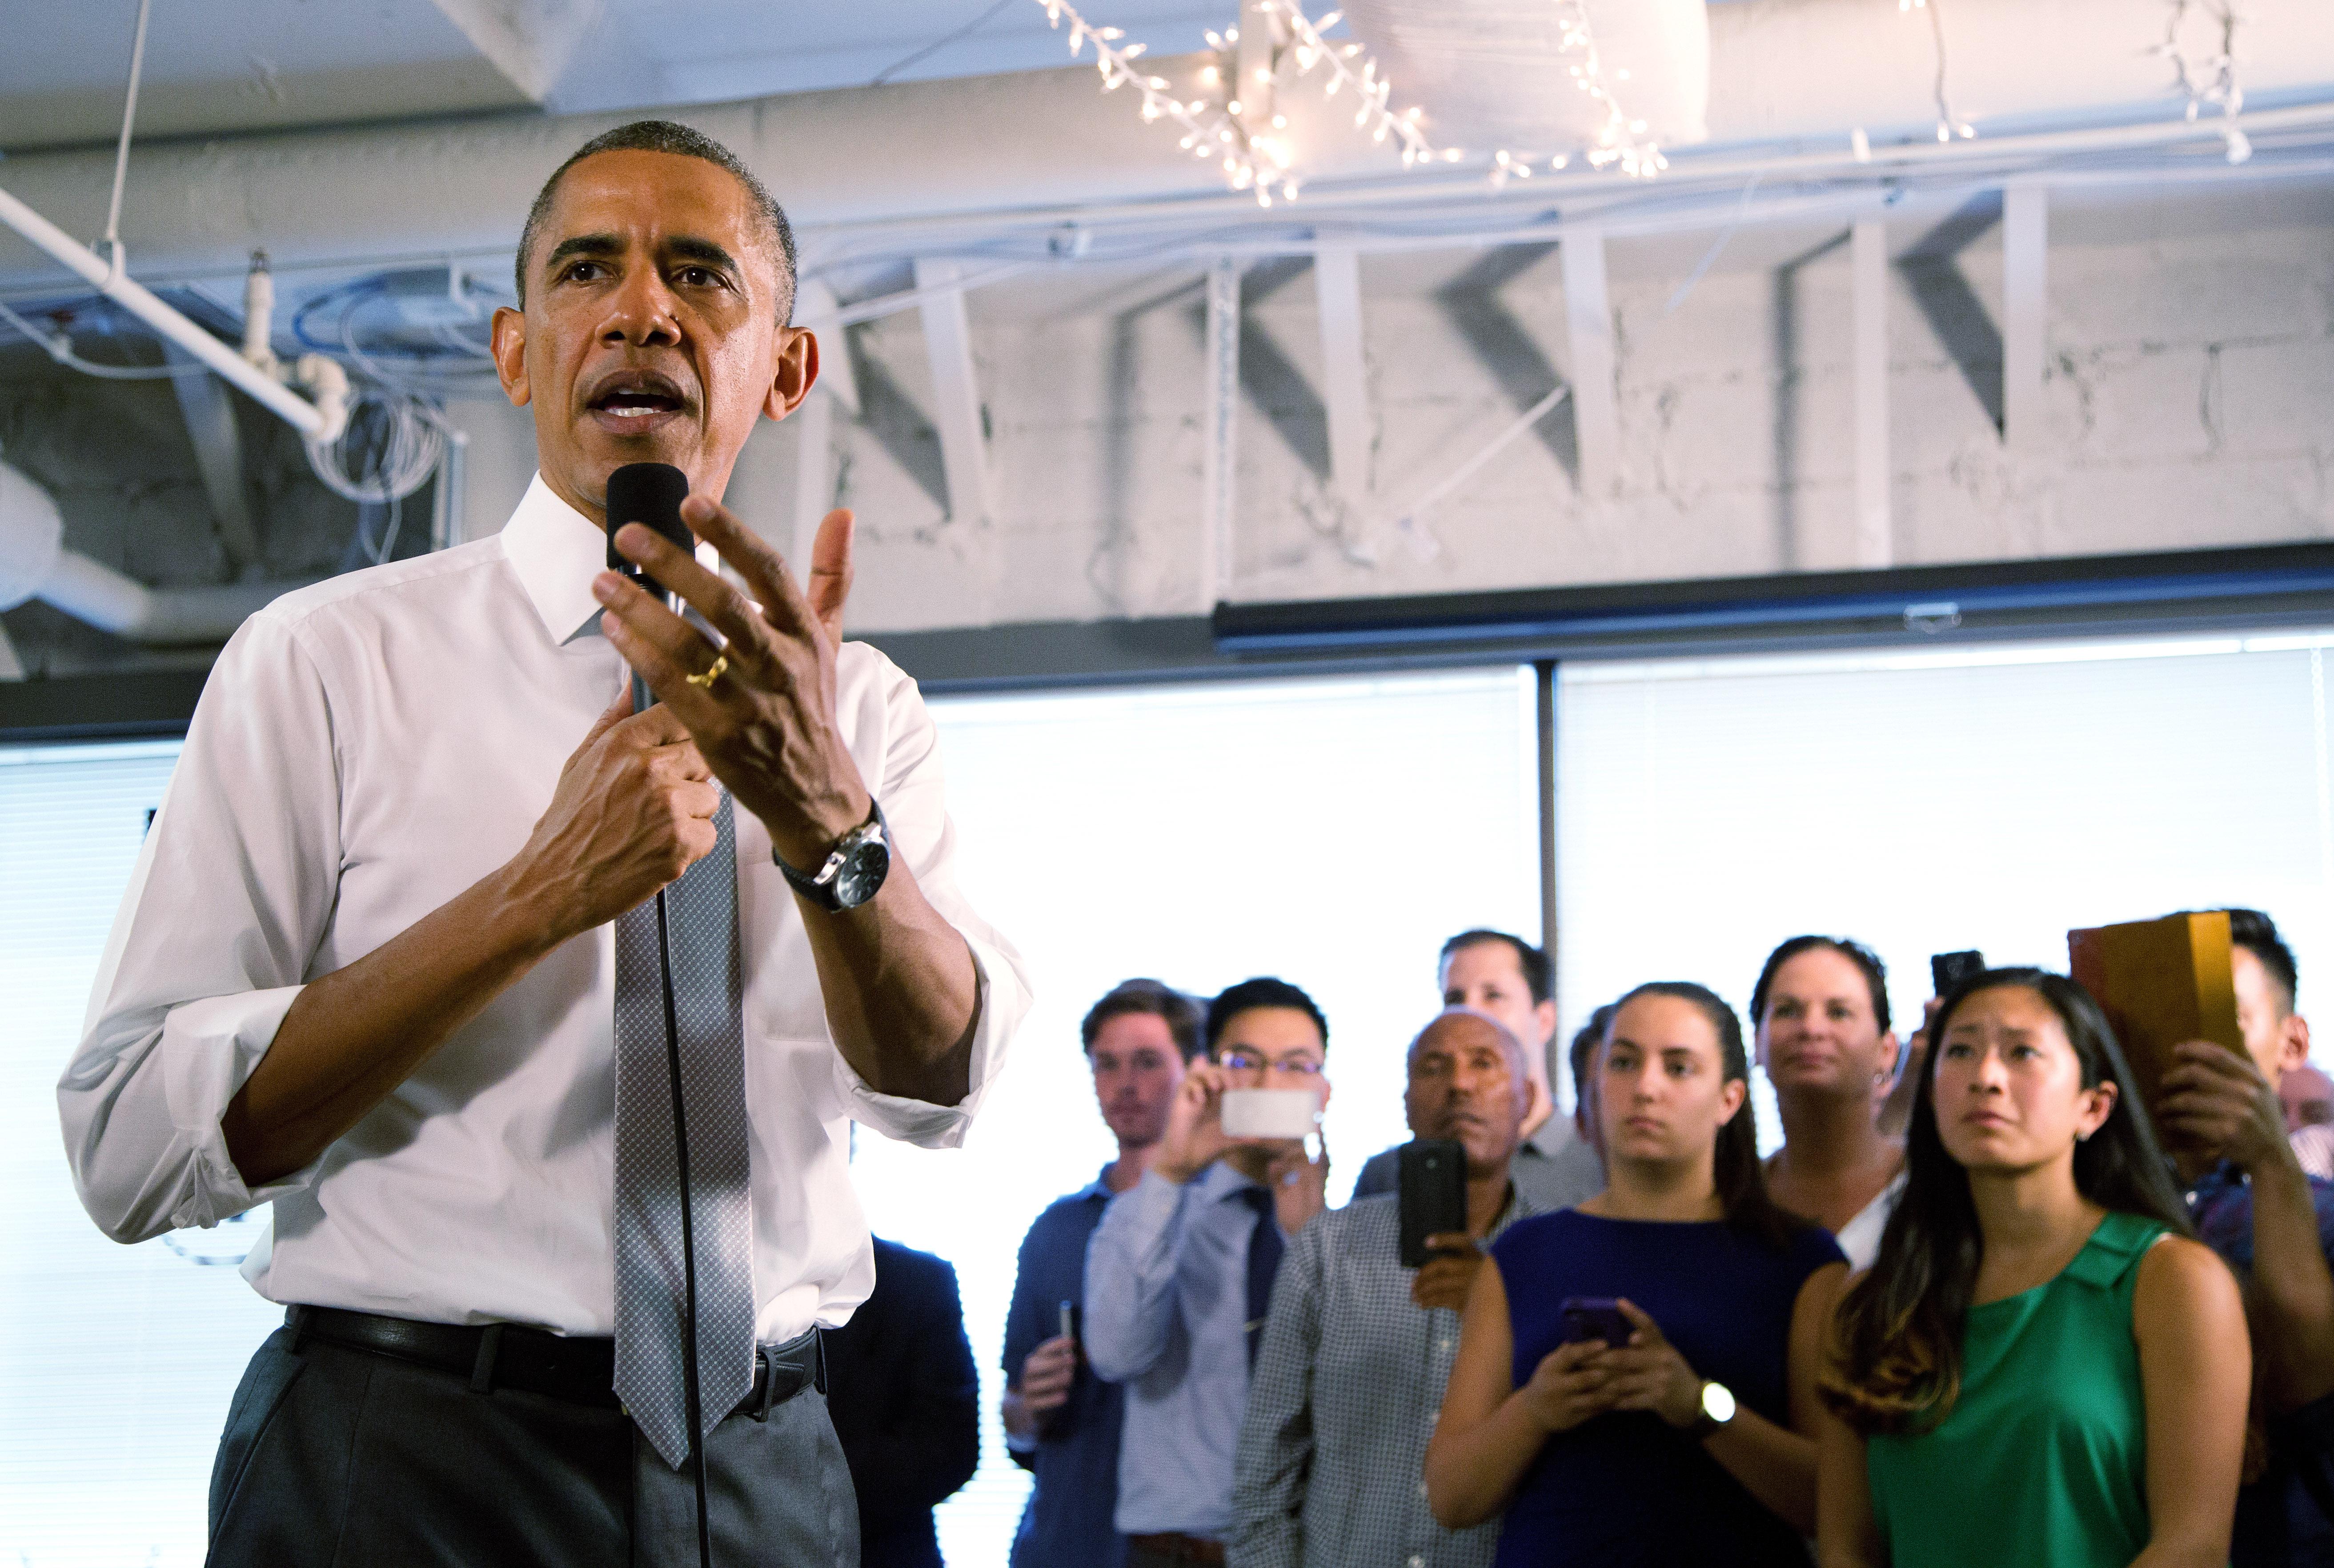 U.S. President Barack Obama speaks about the economy at the technology start-up hub  1776  July 3, 2014 in Washington, DC.